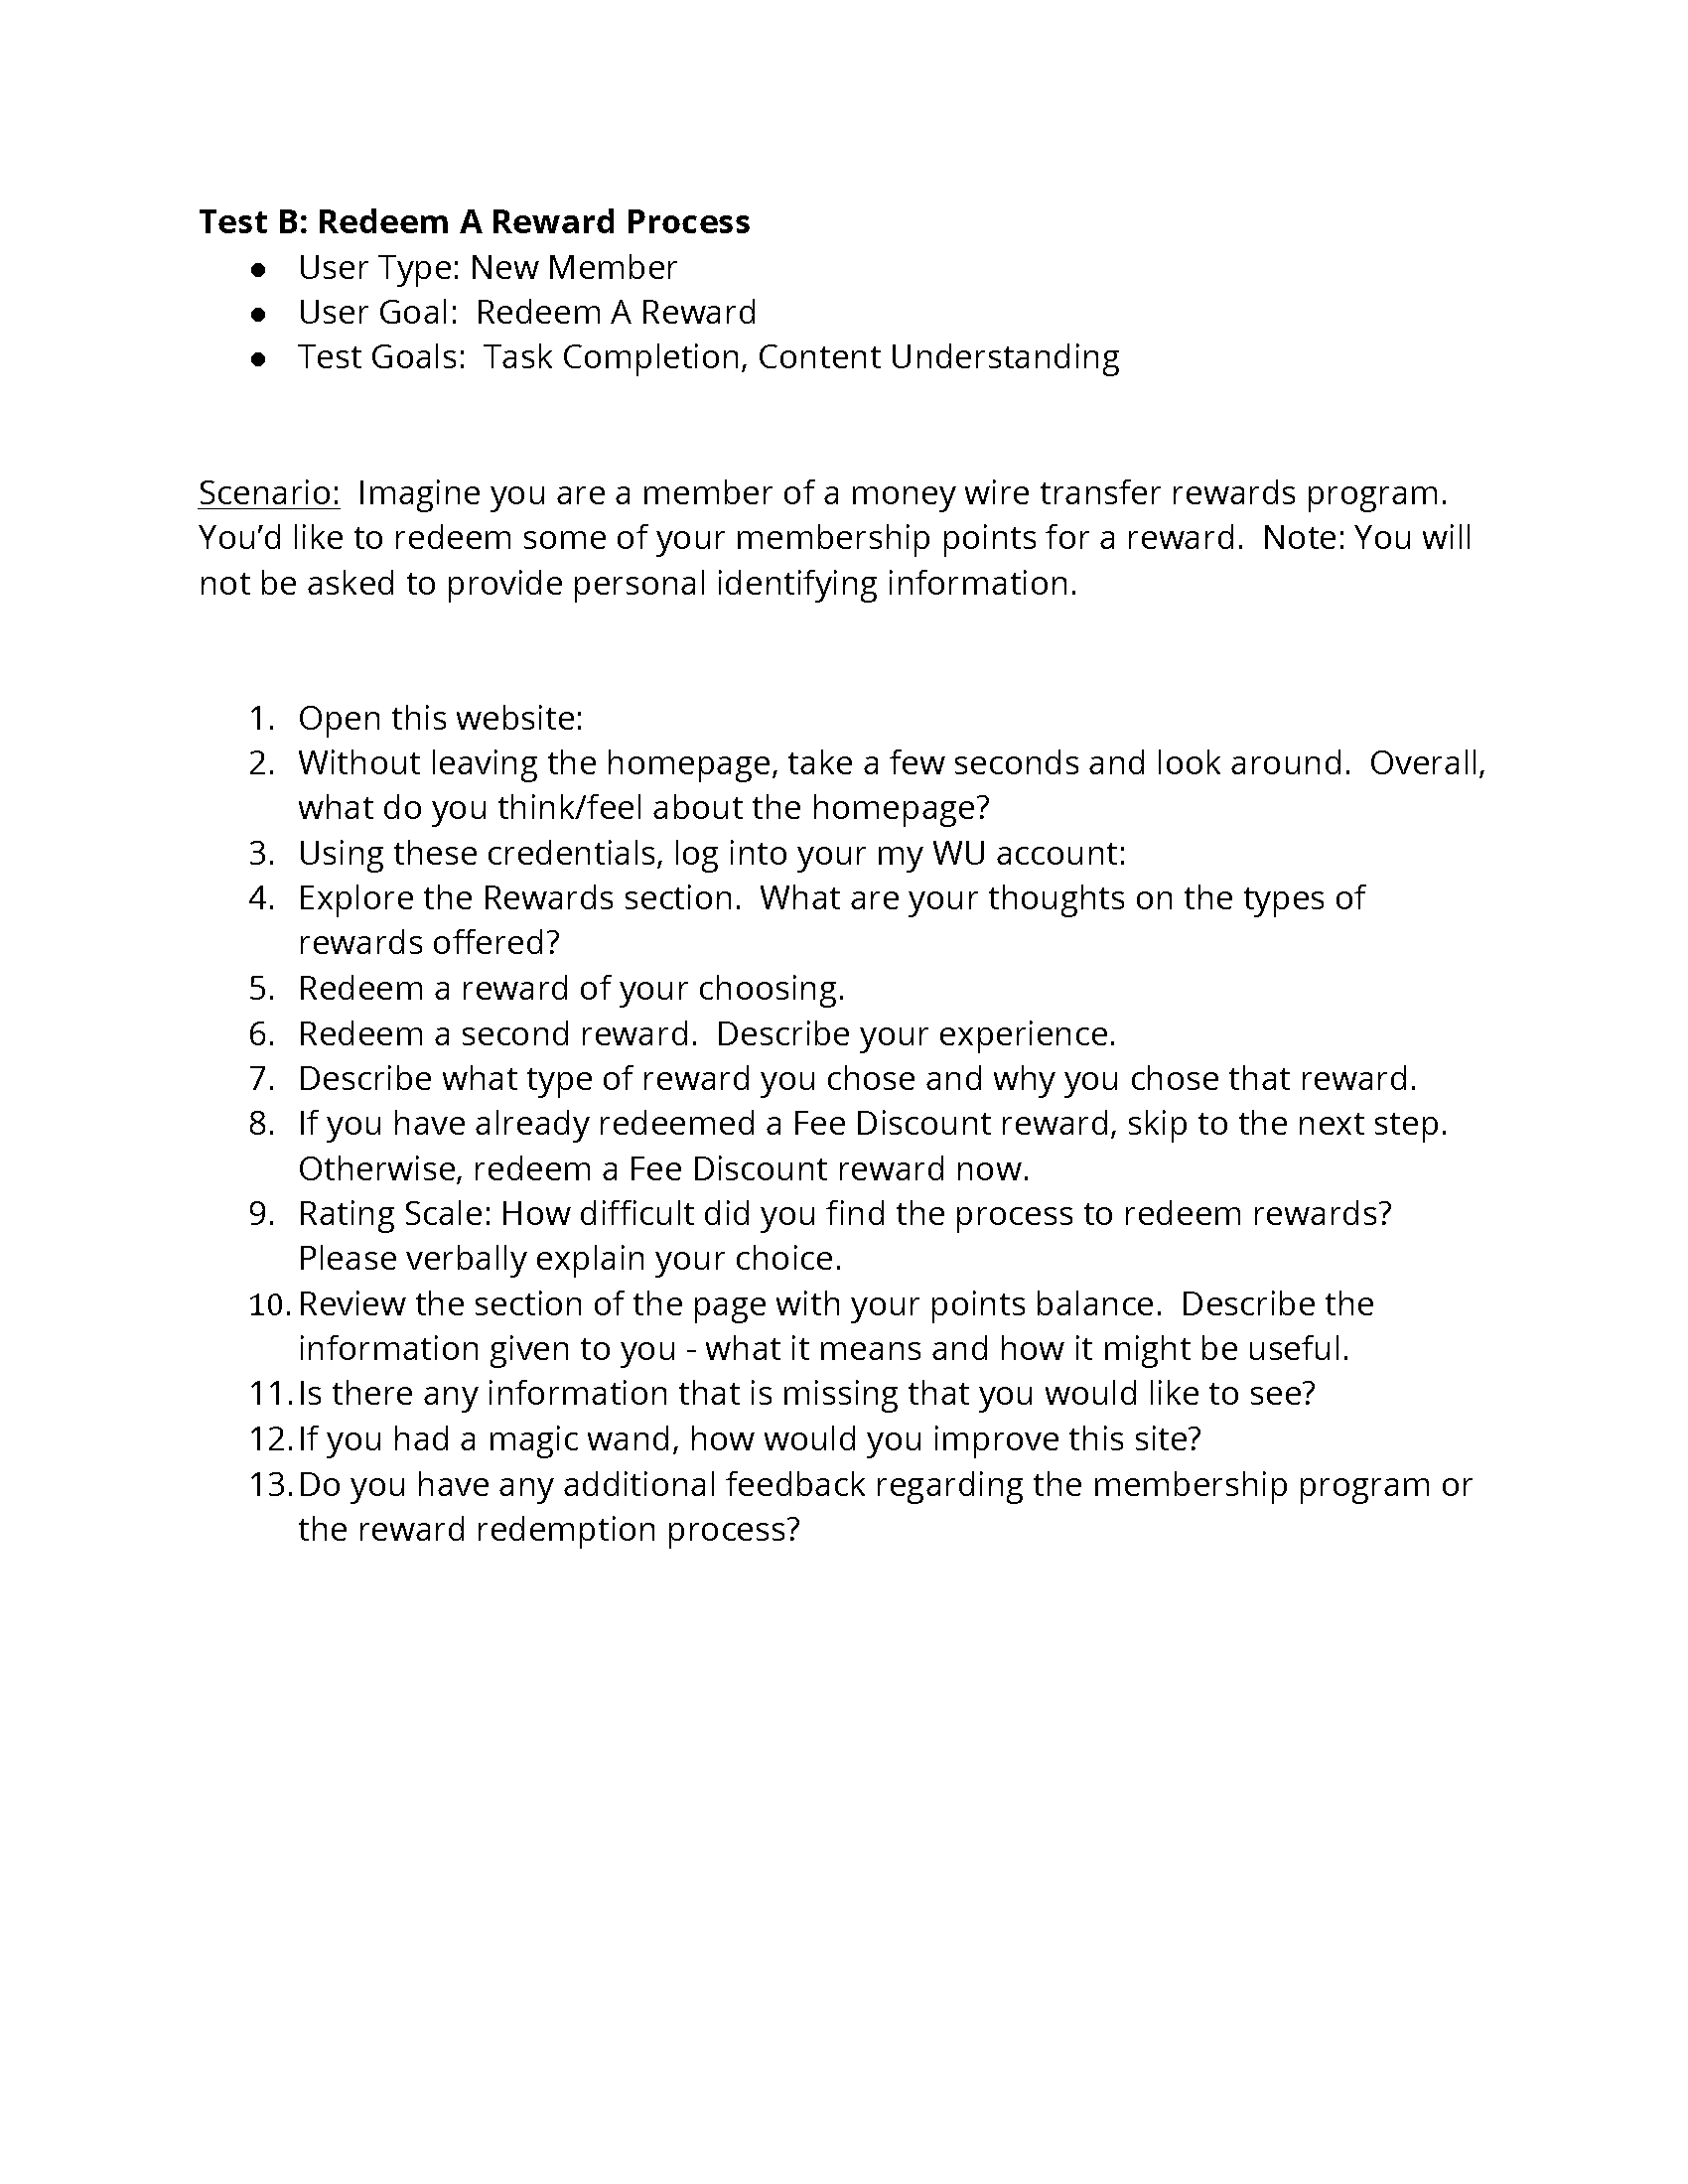 MyWU-UserTestplan Edited_Page_4.png